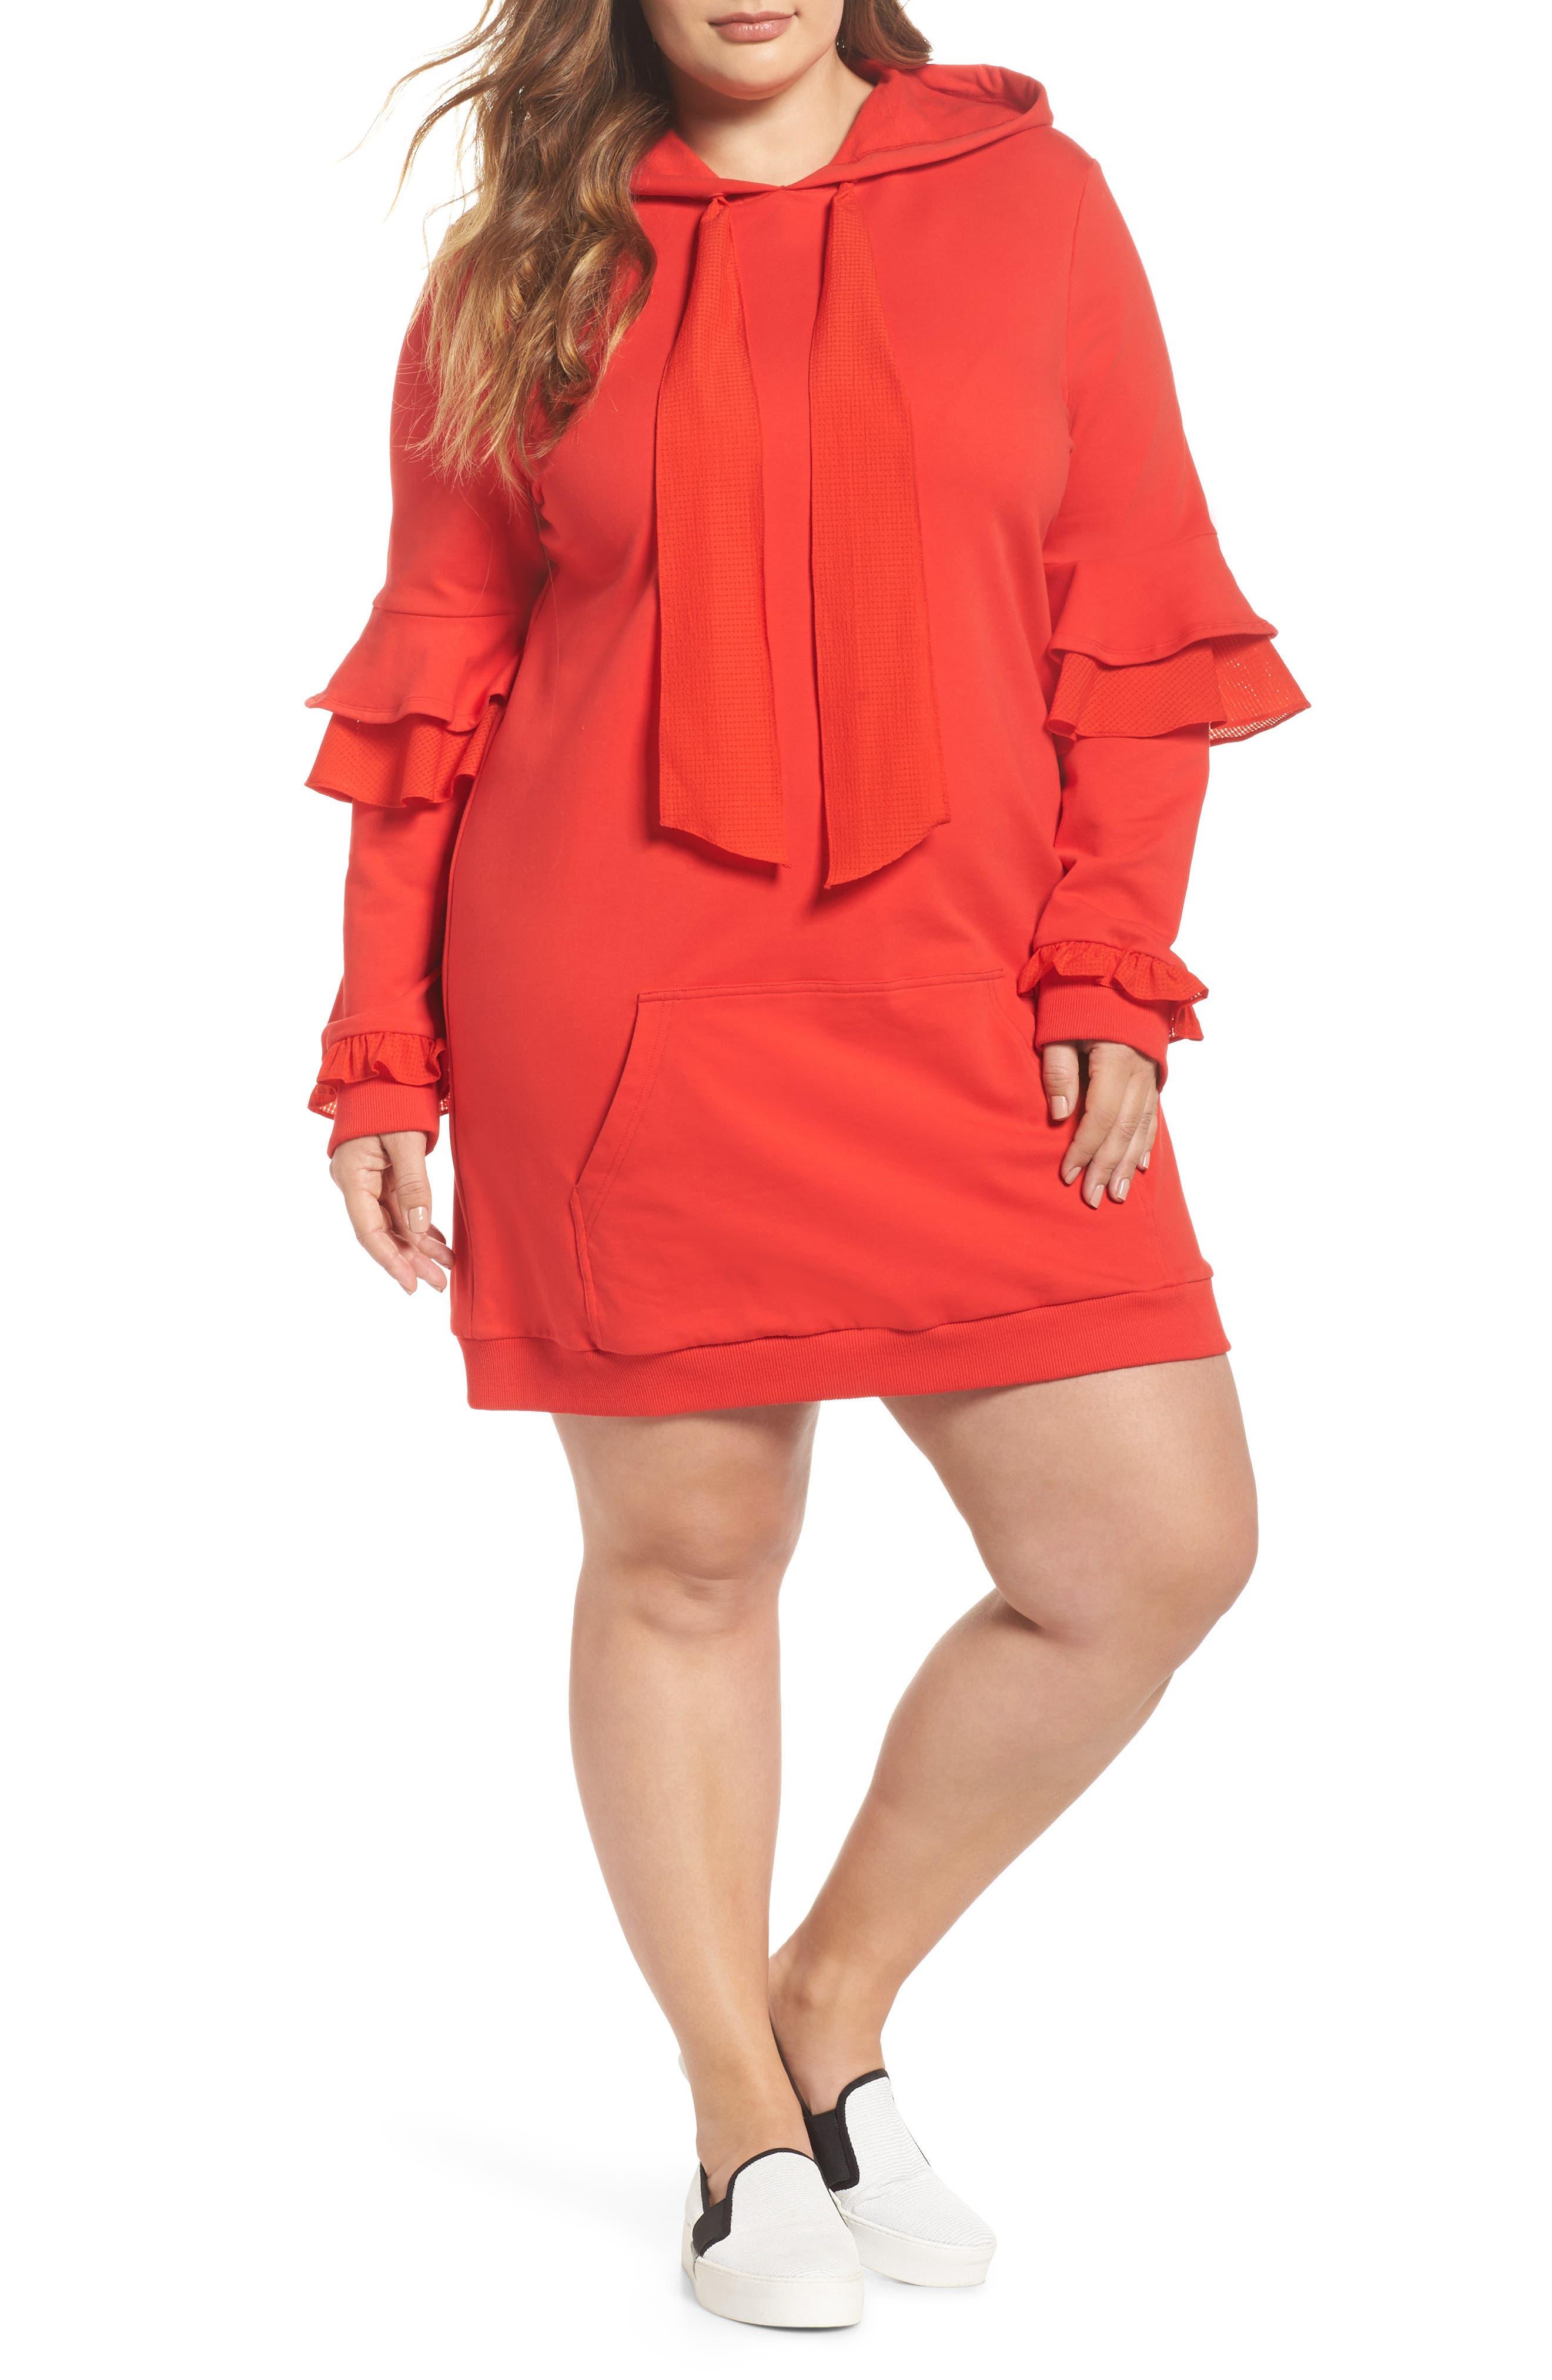 ELVI The Snapdragon Ruffle Sleeve Hoodie Dress (Regular & Plus Size)